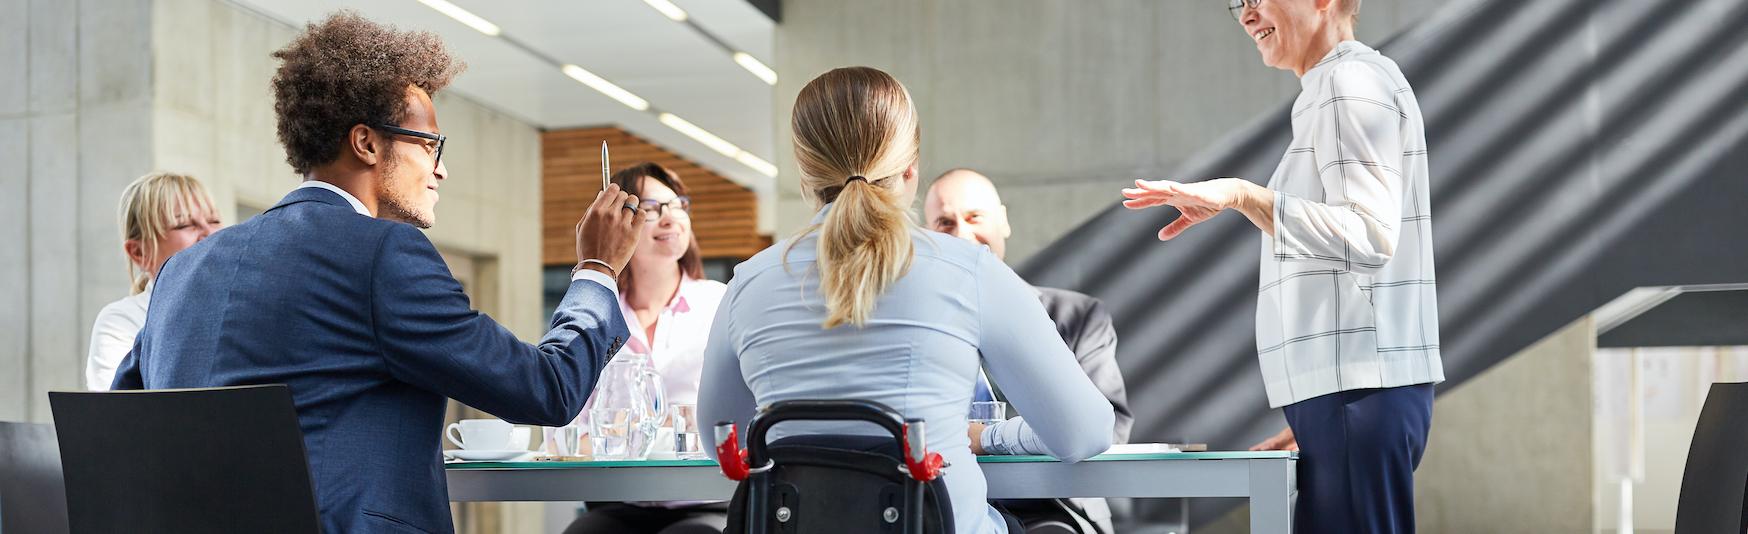 LP_Header-1748x534-dei-coworkers-wheelchair-diverse-meeting